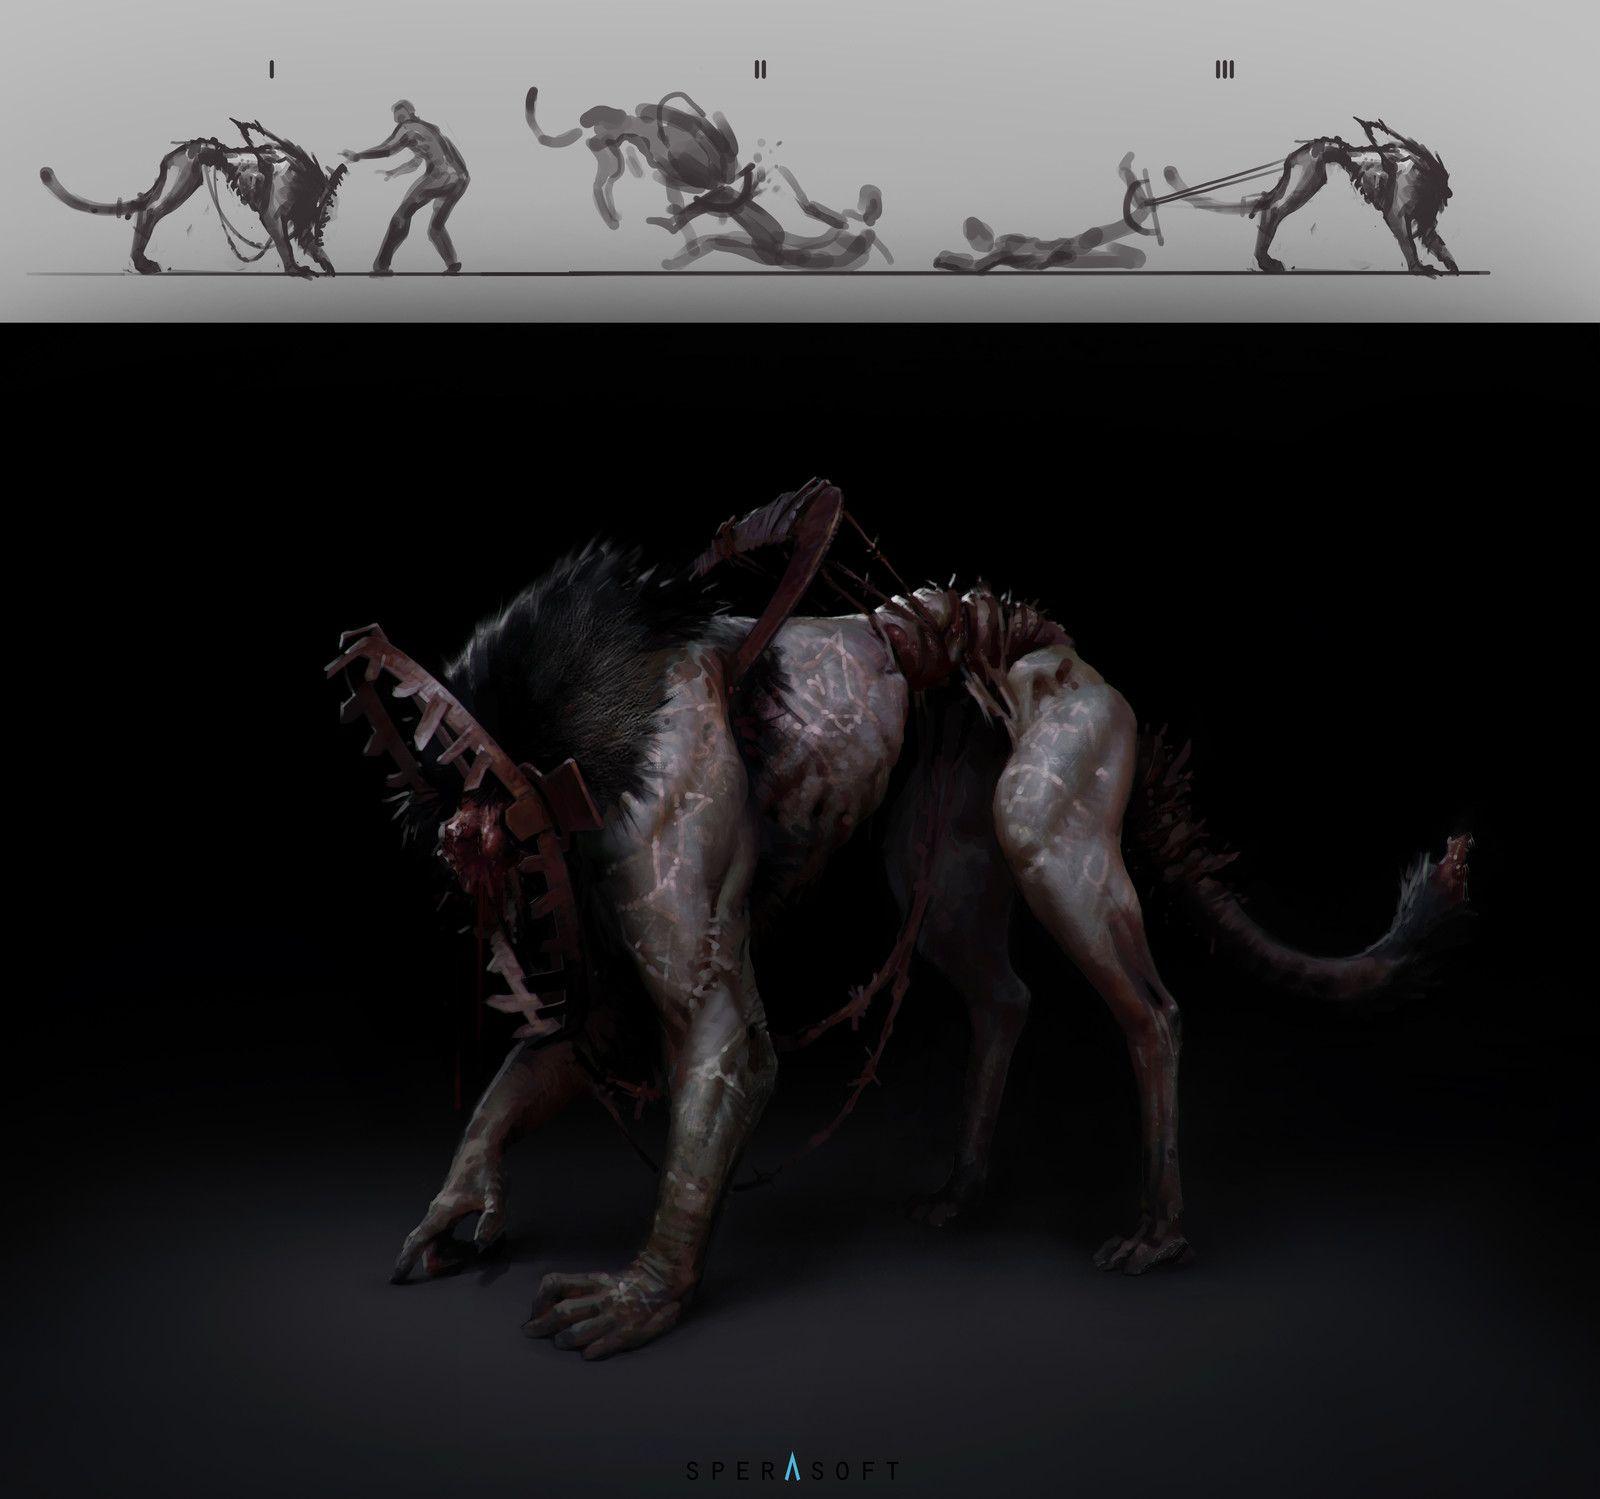 Hell hound 02, Sperasoft Studio on ArtStation at https://www.artstation.com/artwork/lLWPY